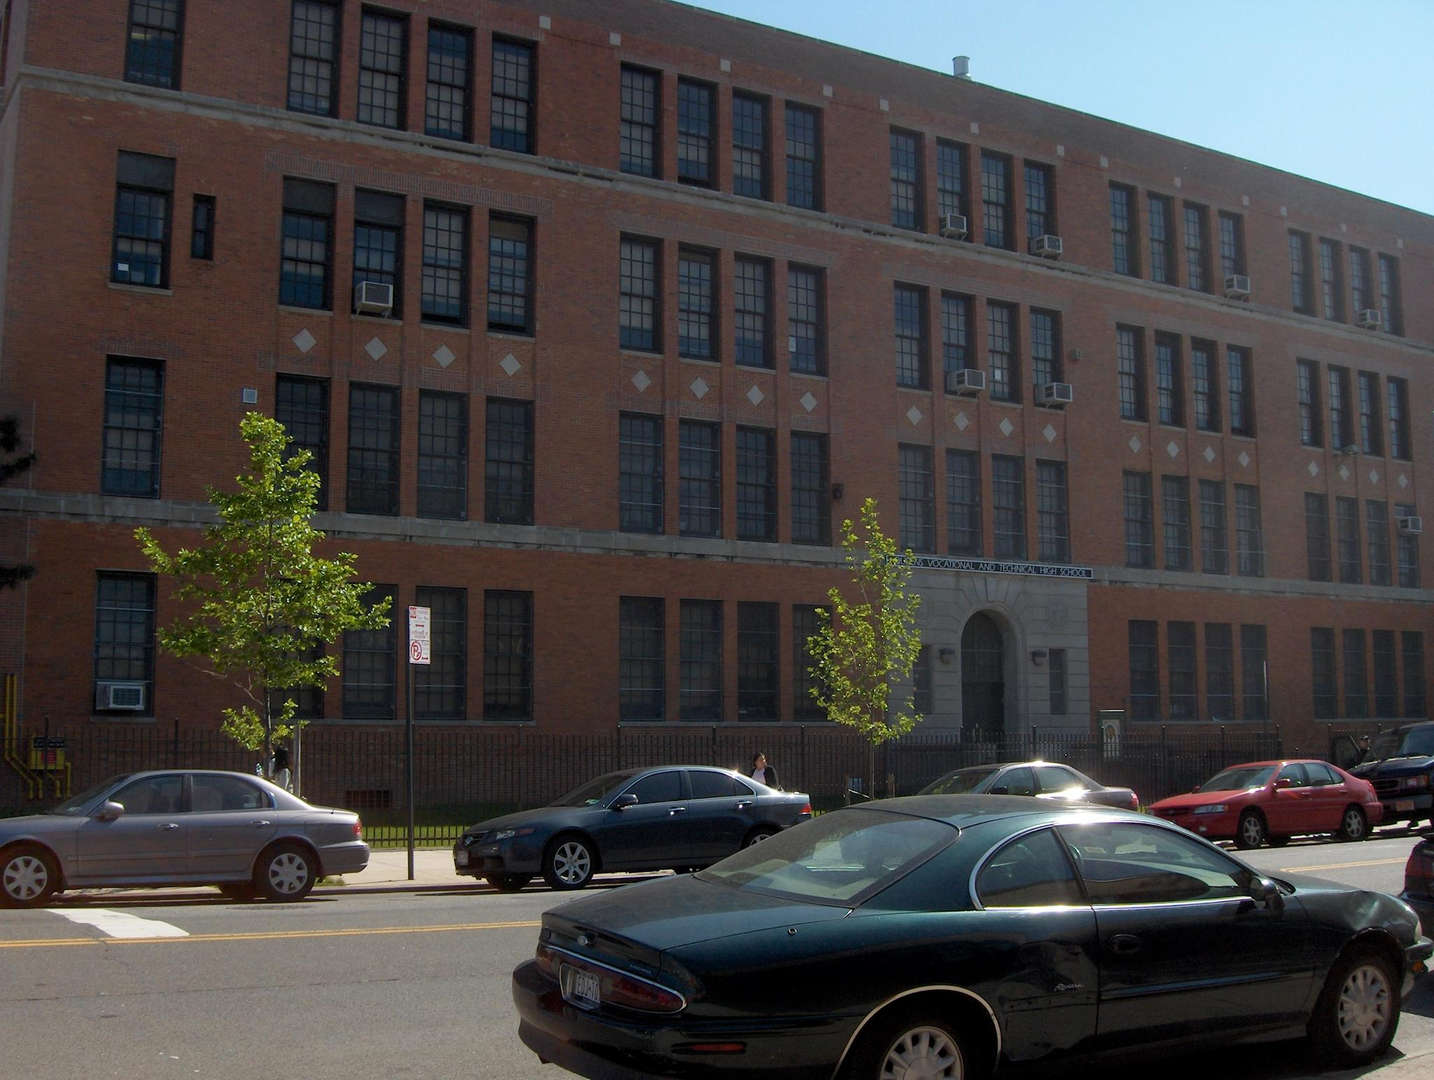 Exterior photo of Queens Technical High School